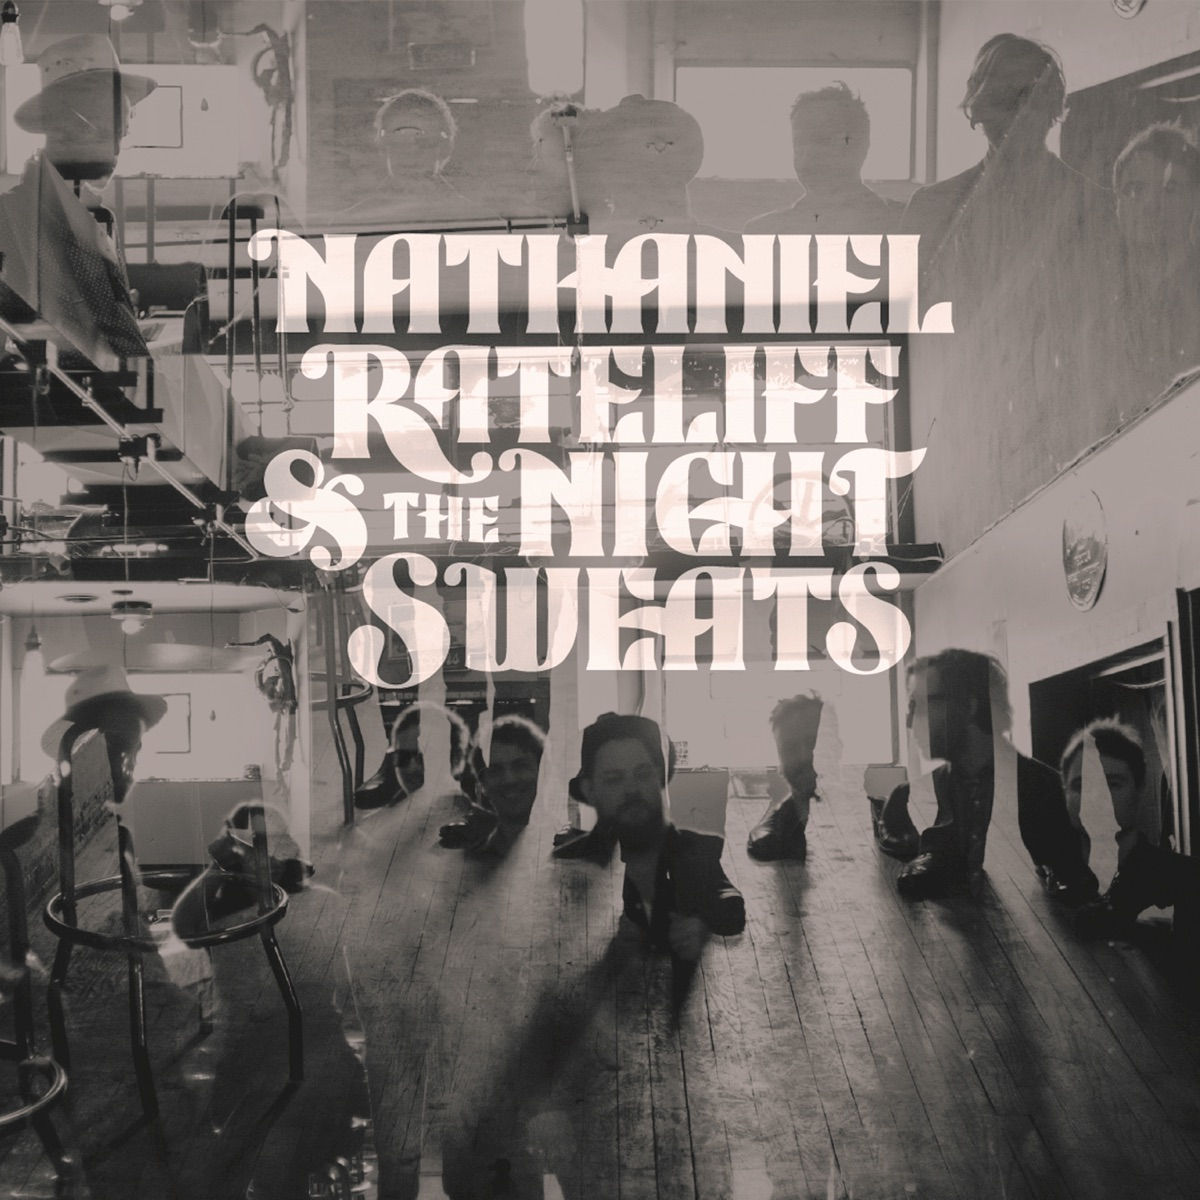 SOB - Single Nathaniel Rateliff  The Night Sweats CD cover